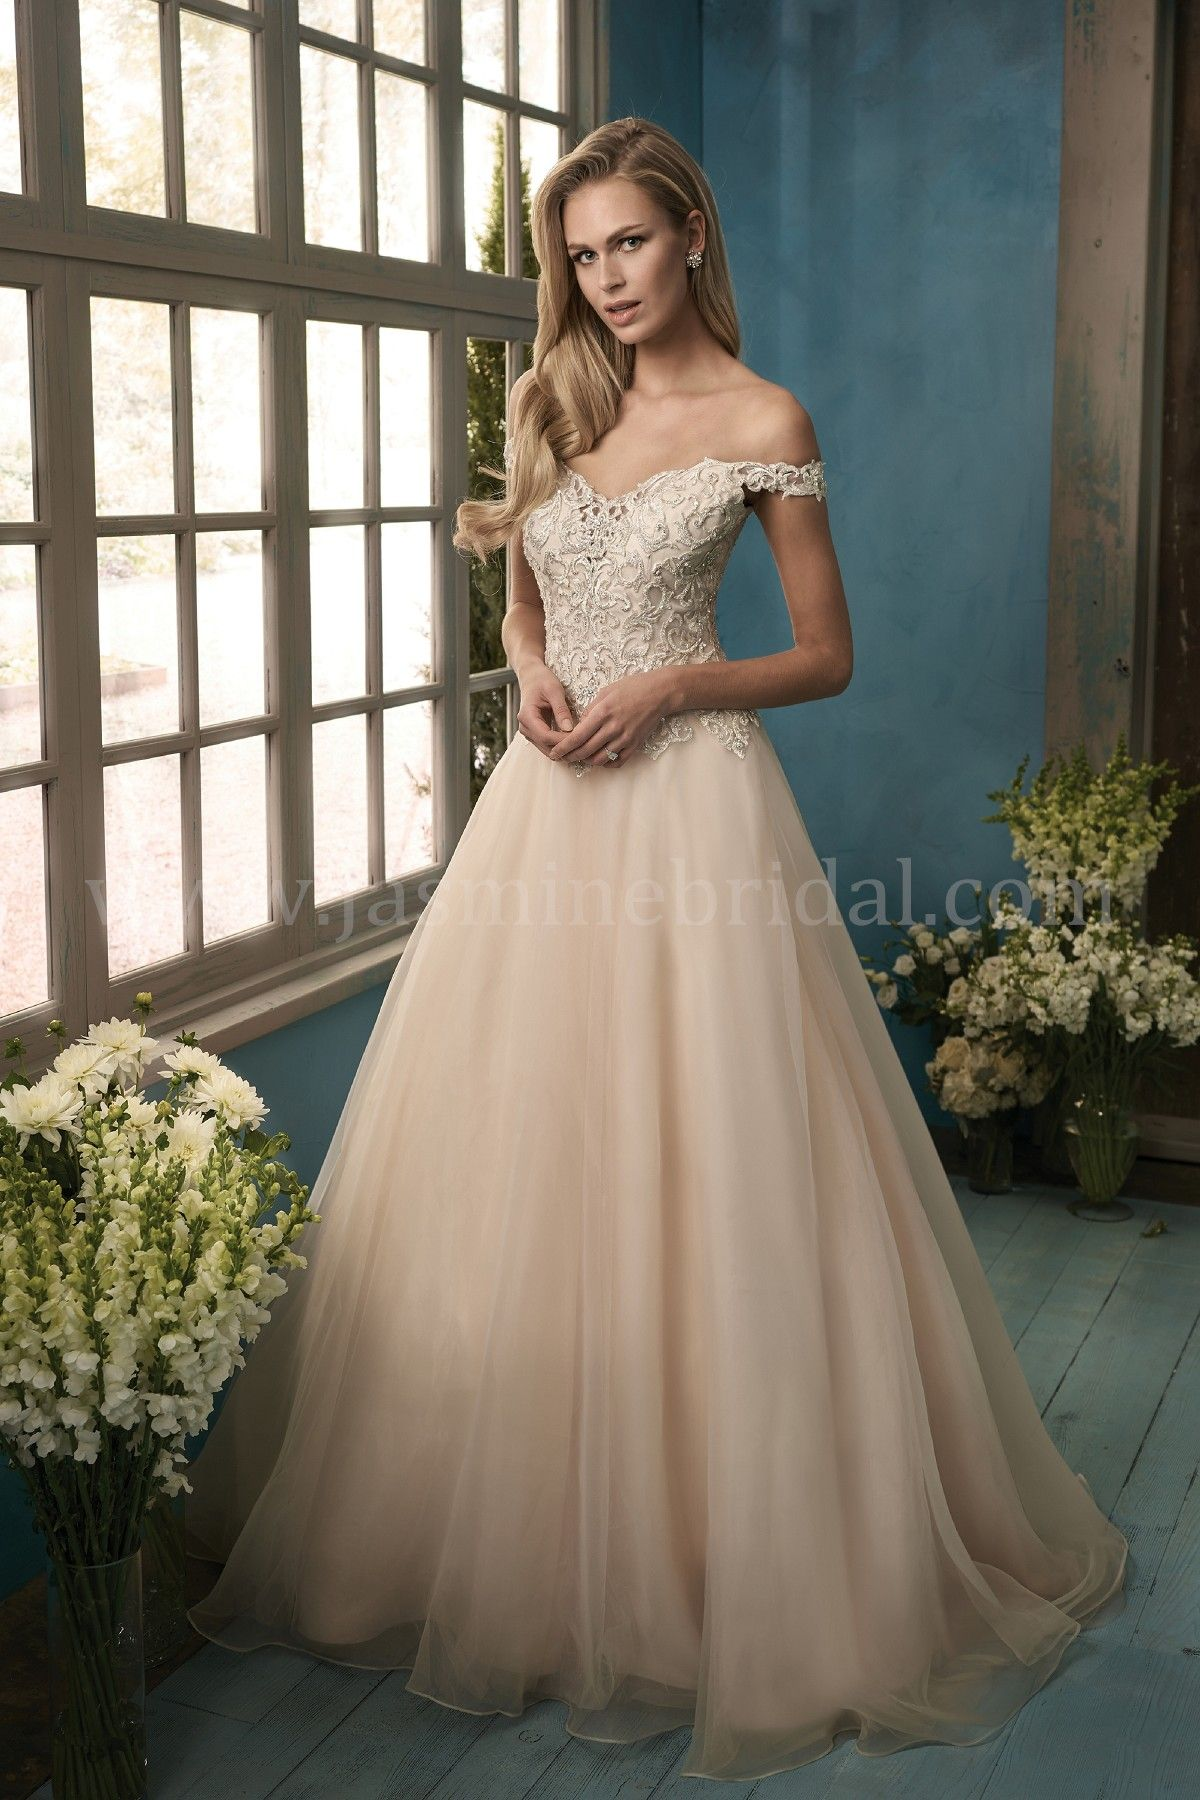 Jasmine Bridal Modest Wedding Gowns Jasmine Bridal Bridesmaid Dressing Gowns [ 1800 x 1200 Pixel ]